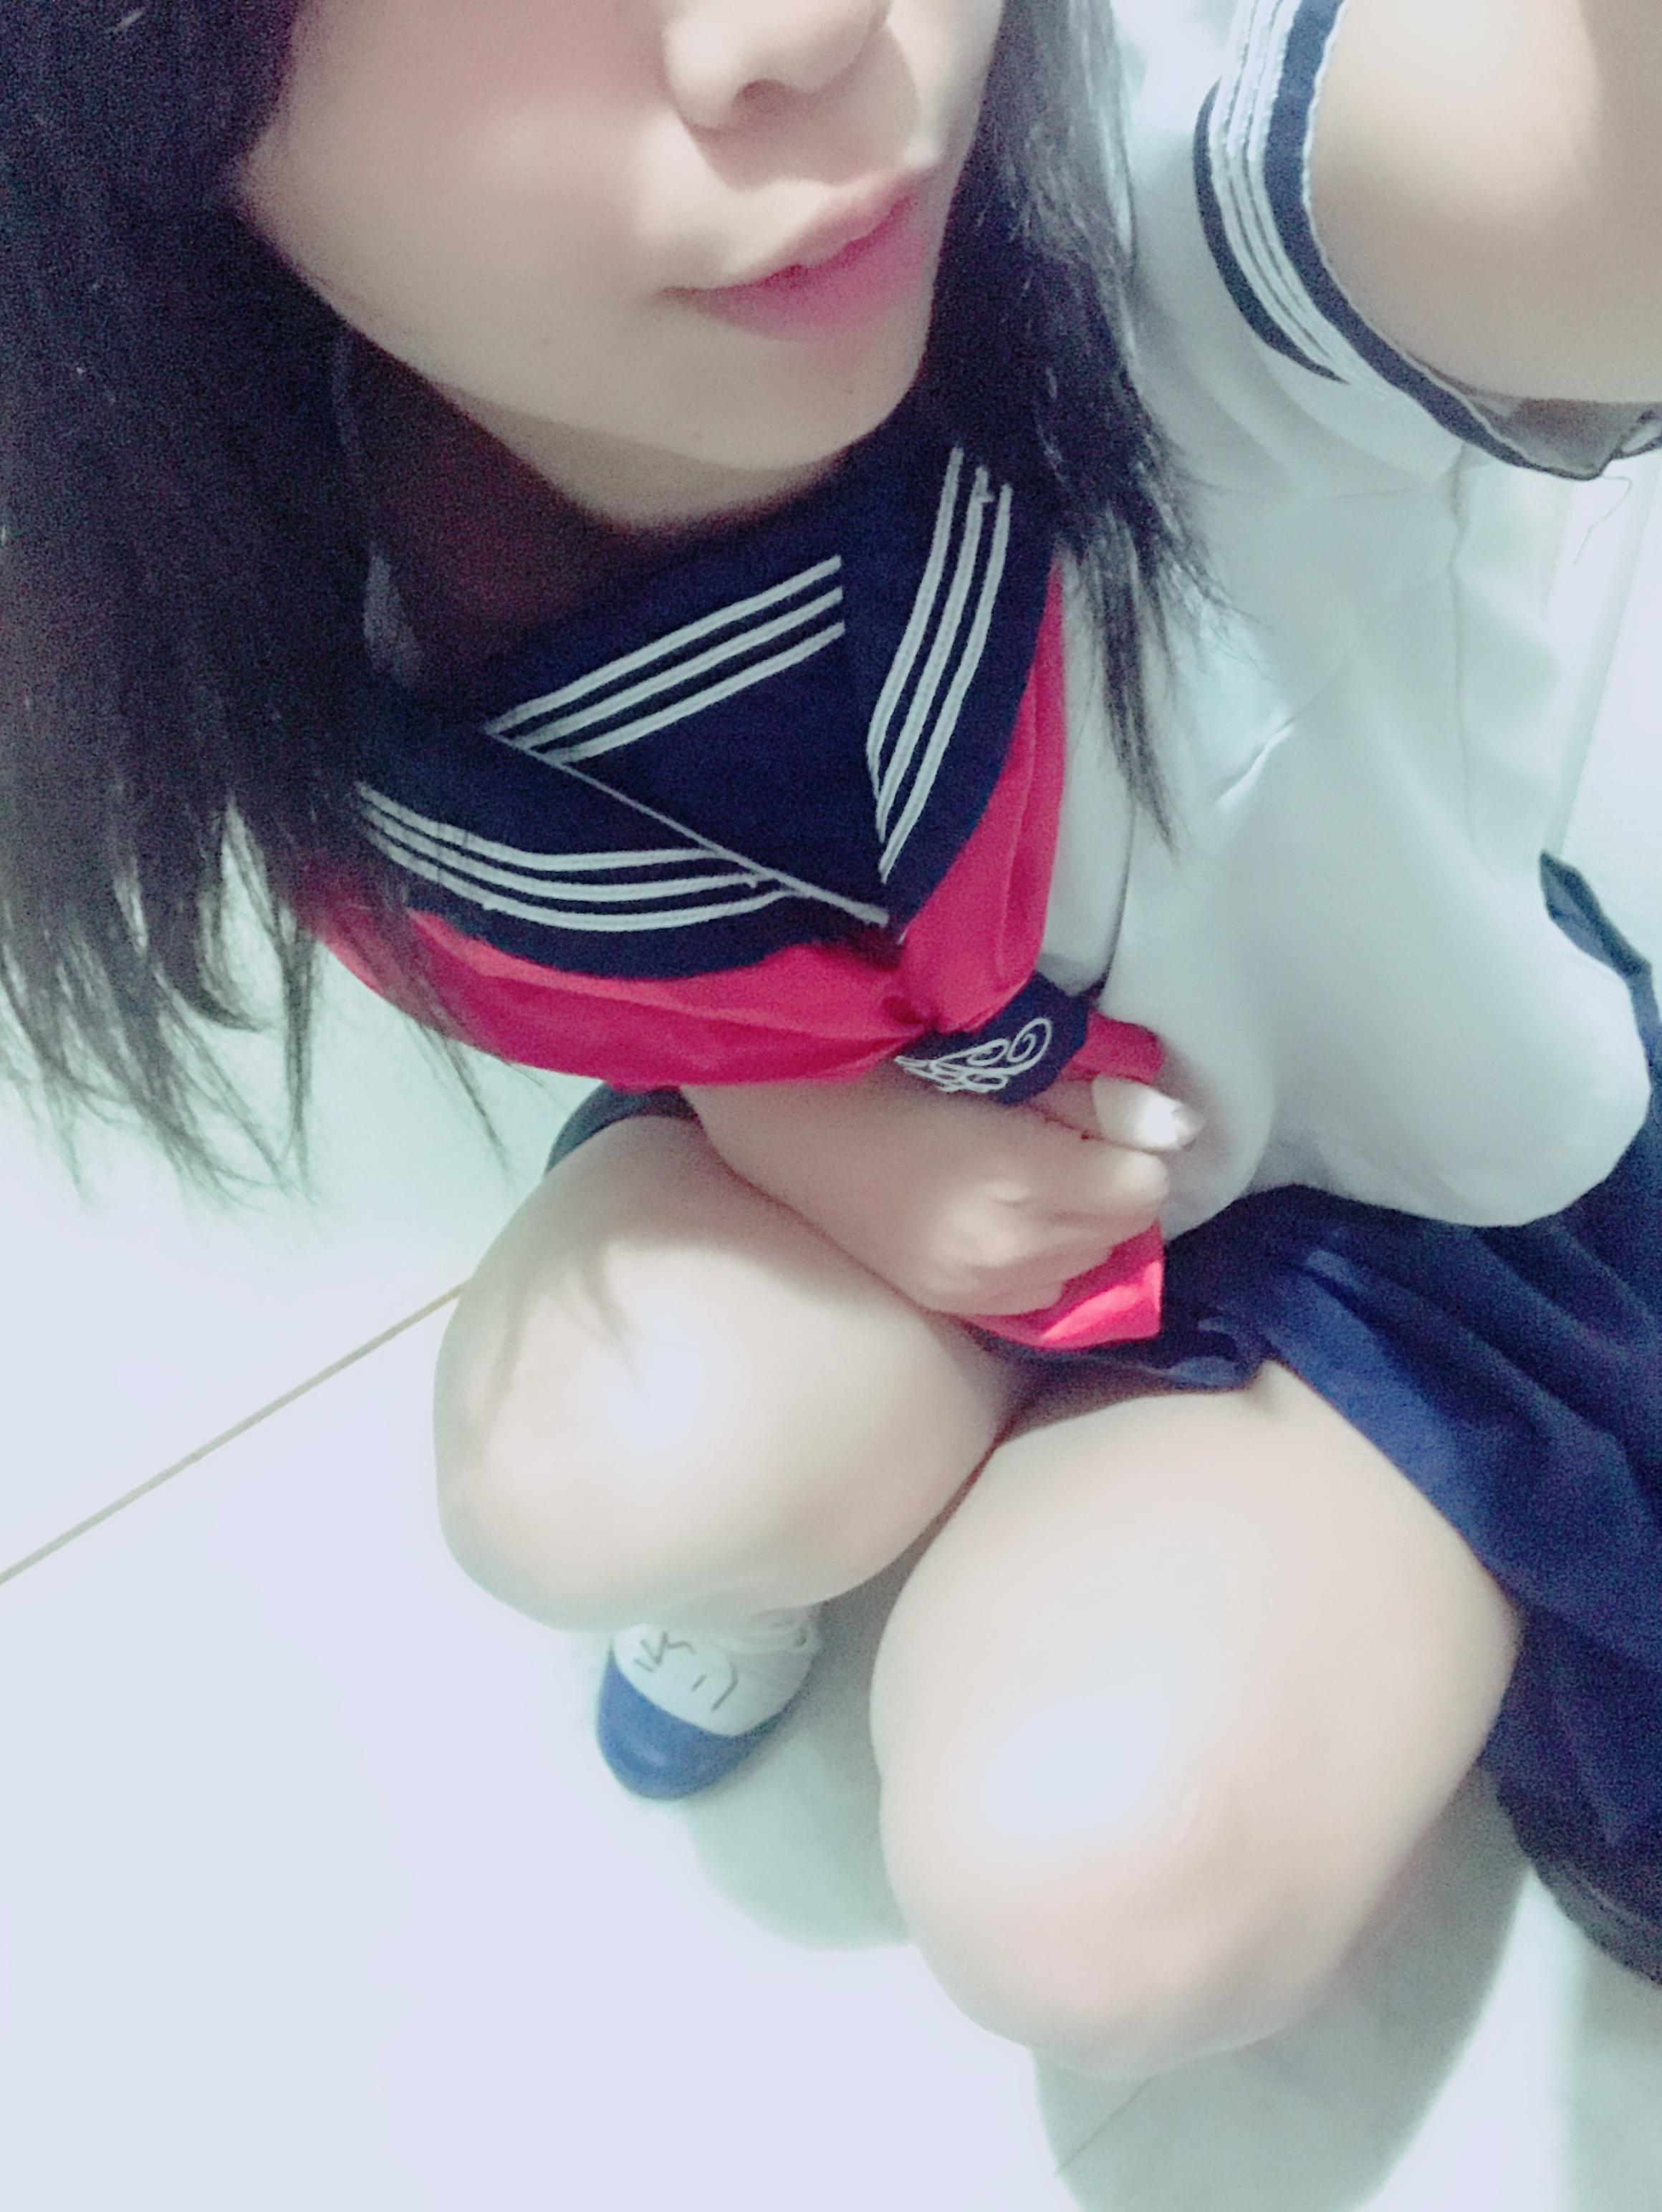 「No42 河西」09/20日(木) 00:36 | 河西の写メ・風俗動画